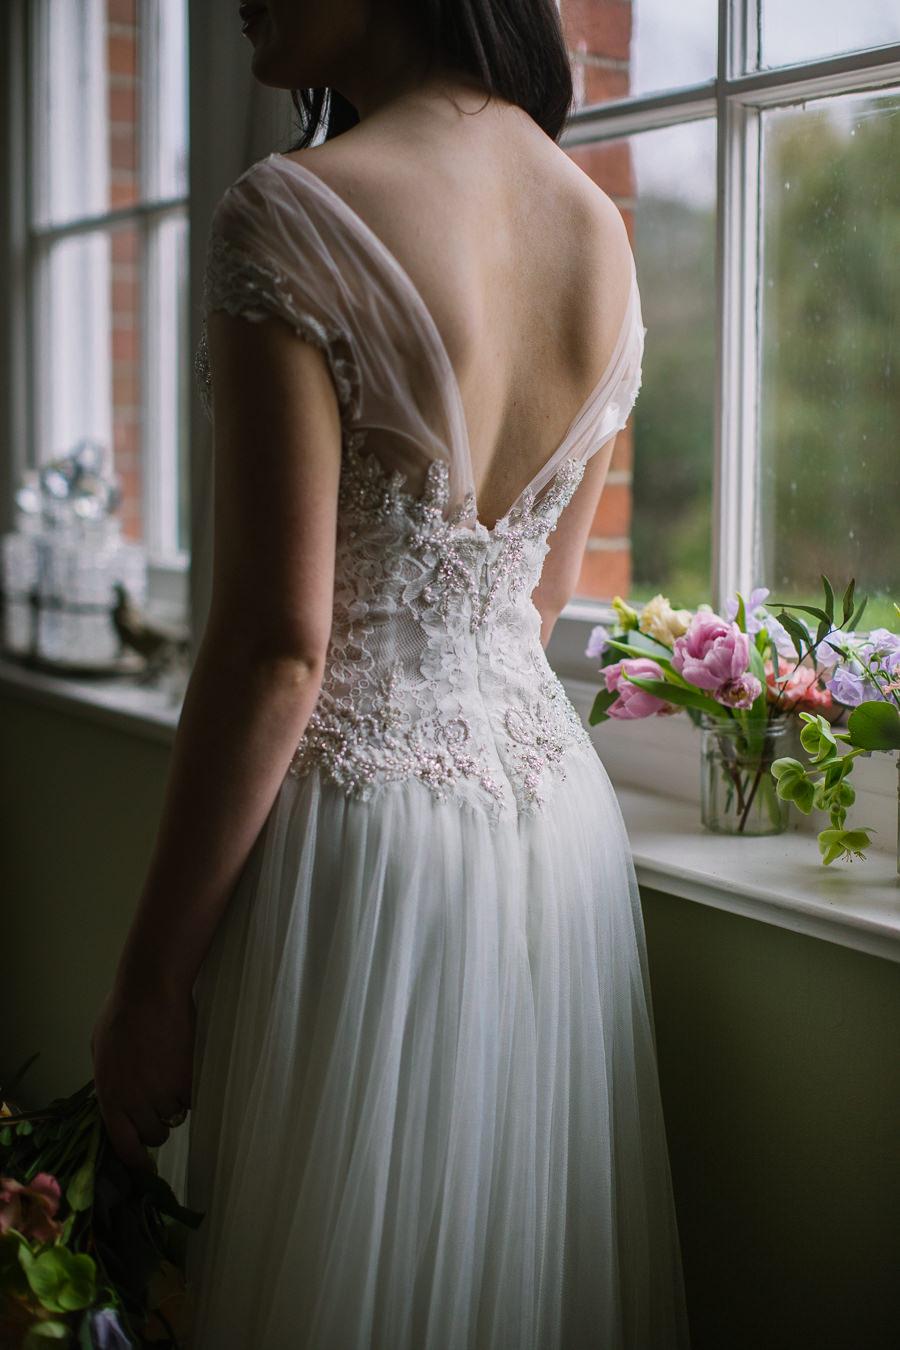 'Understated Elegance' Spring Styled Hampshire Bridal Shoot – Rownhams House, photo credit Nisha Haq Photography (9)